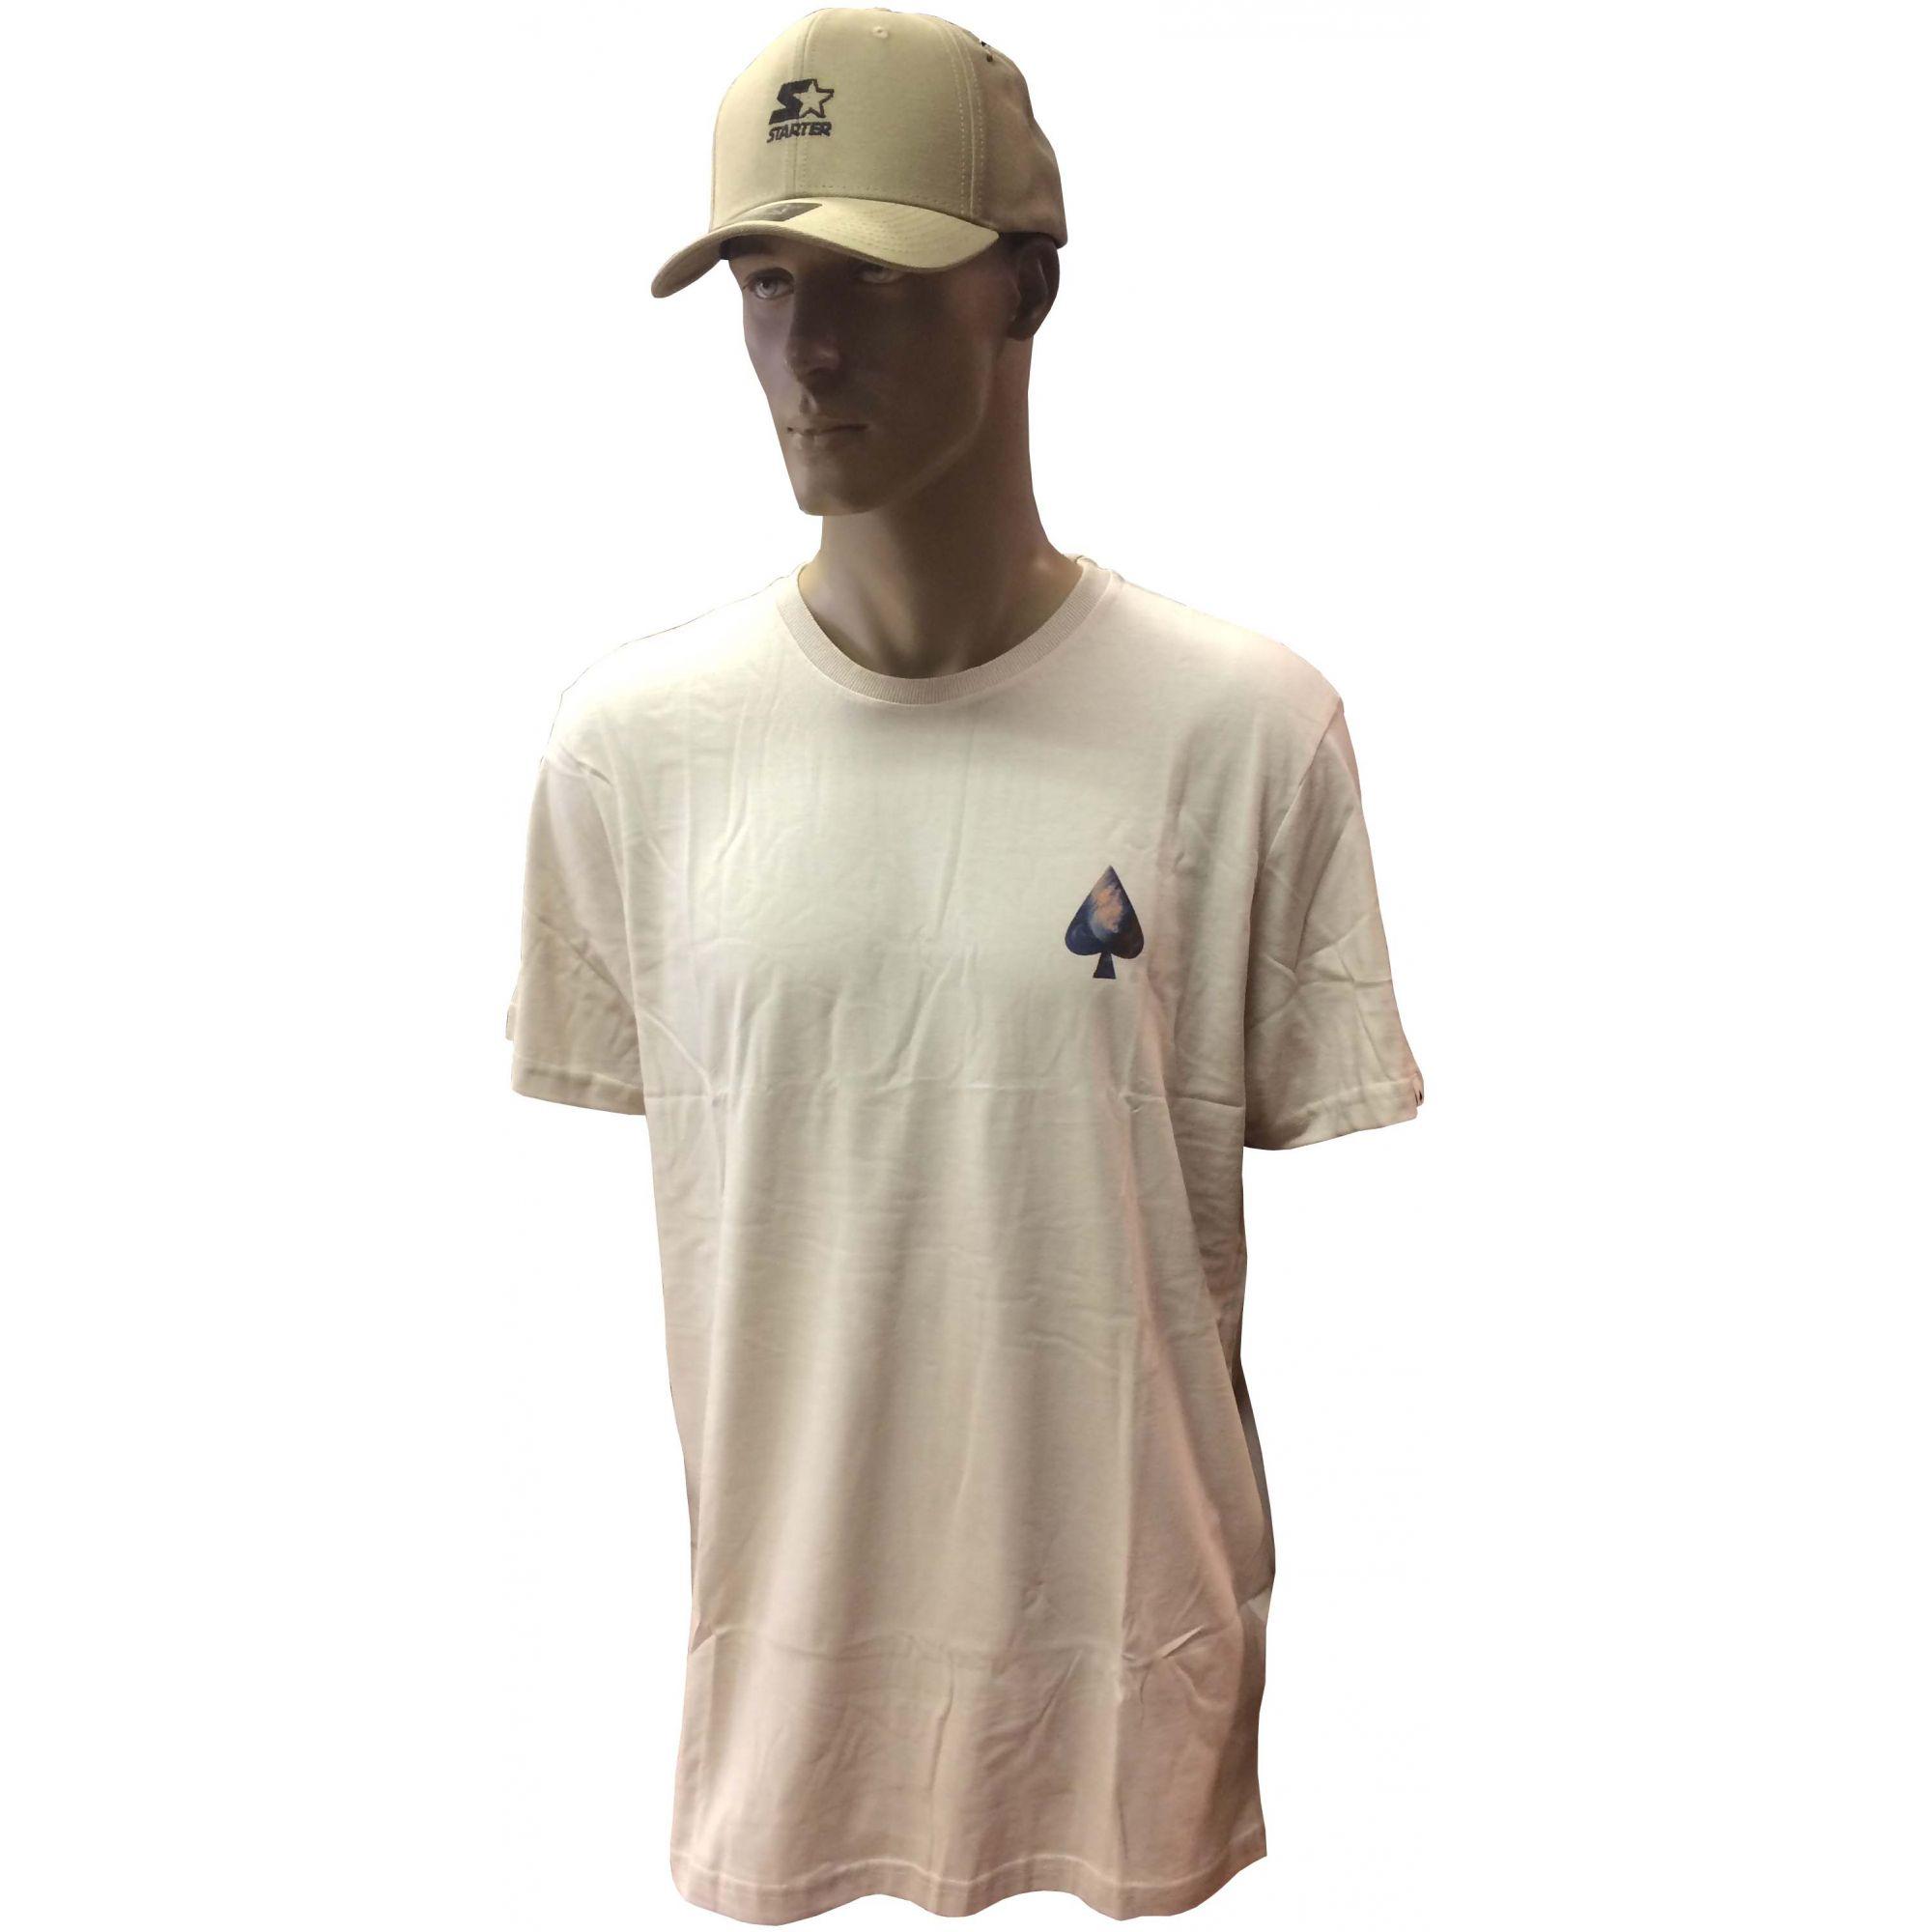 Camiseta Mcd Divided Brain Masculina